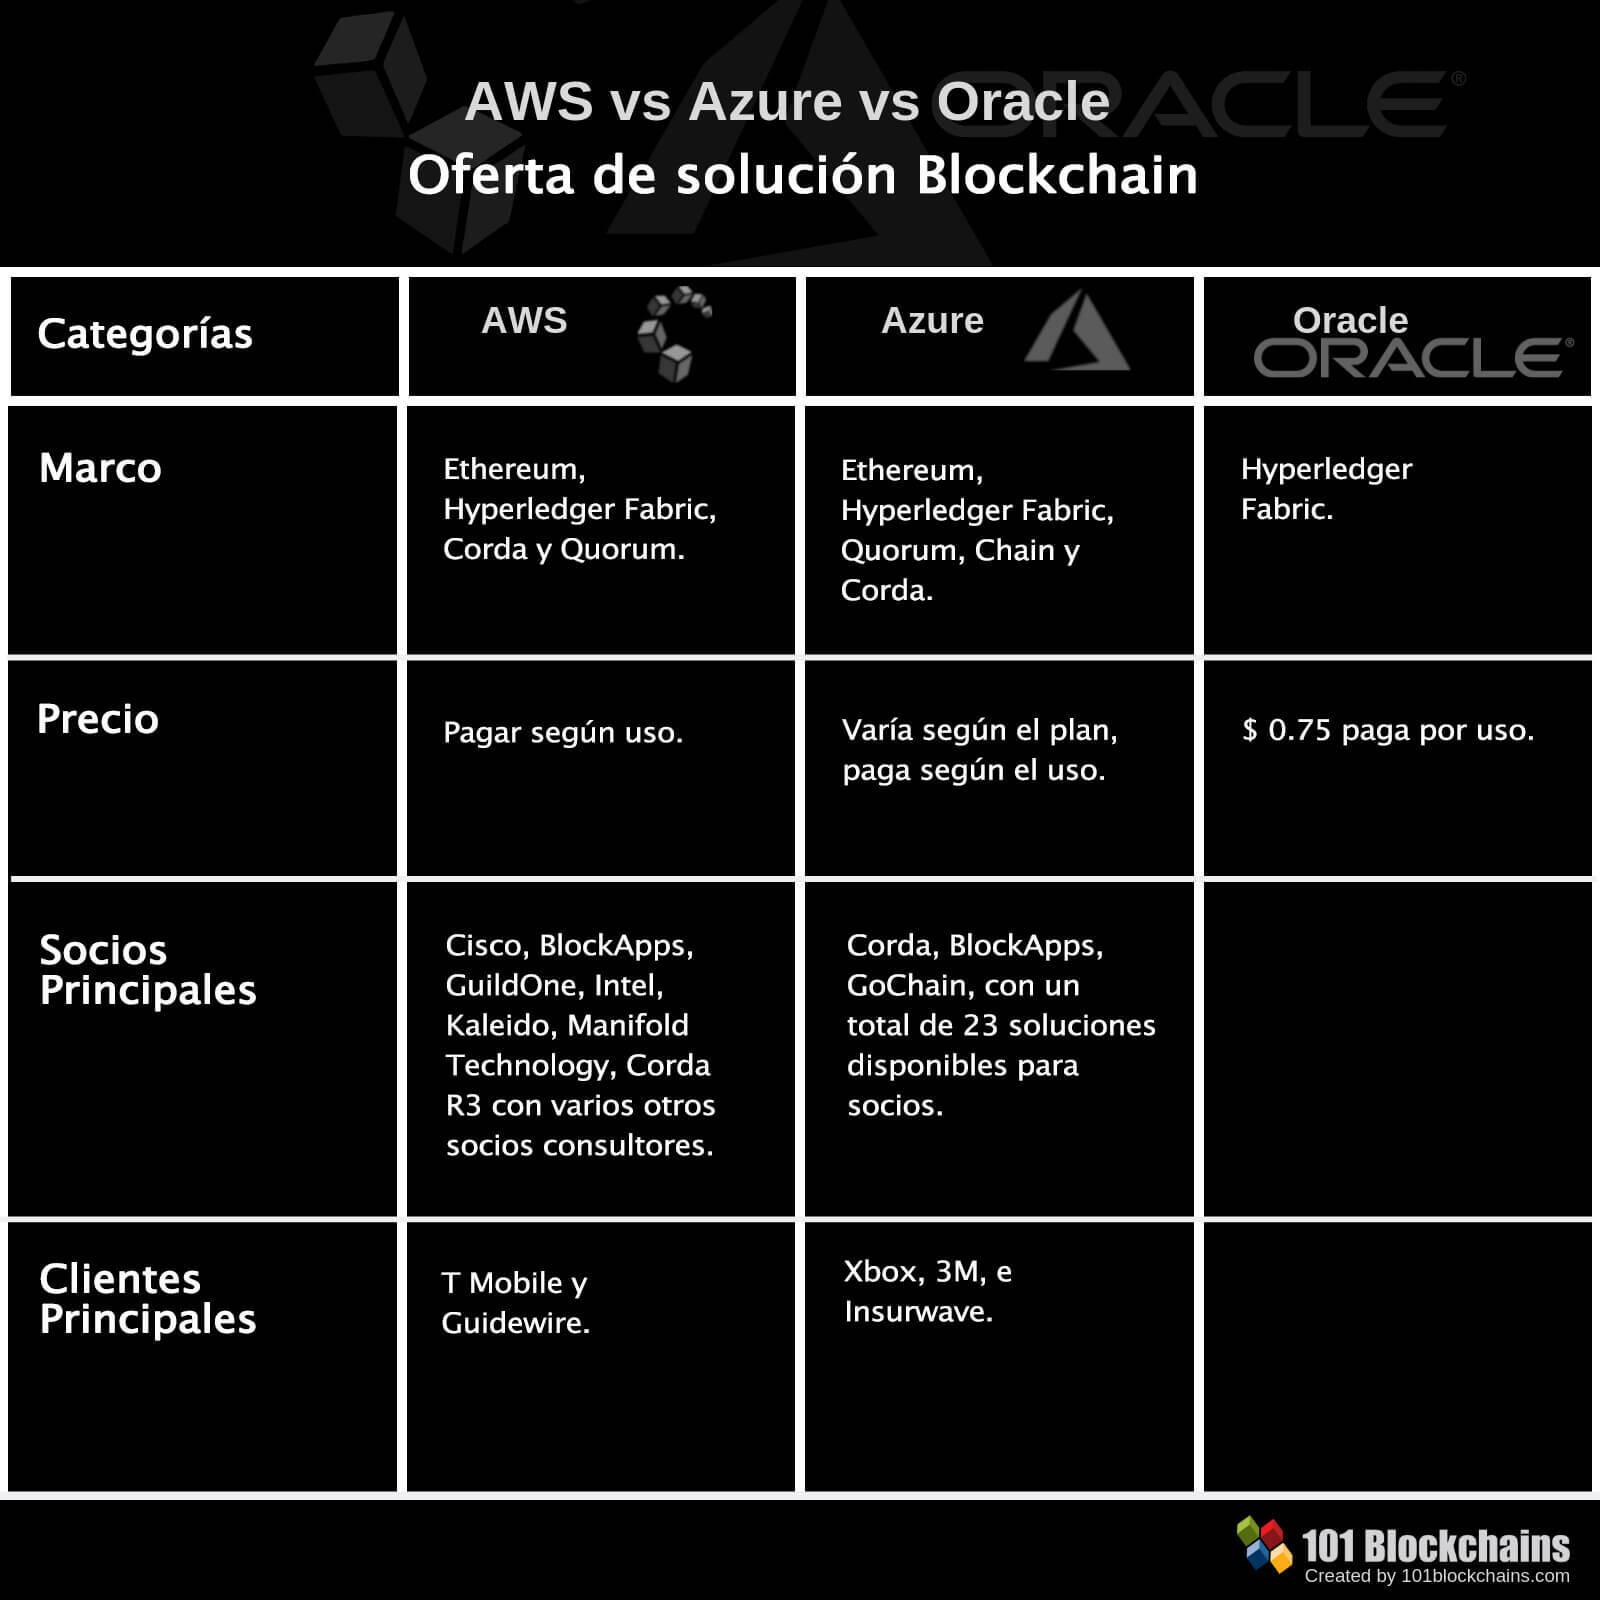 AWS vs AZURE vs Oracle Blockchain BaaS